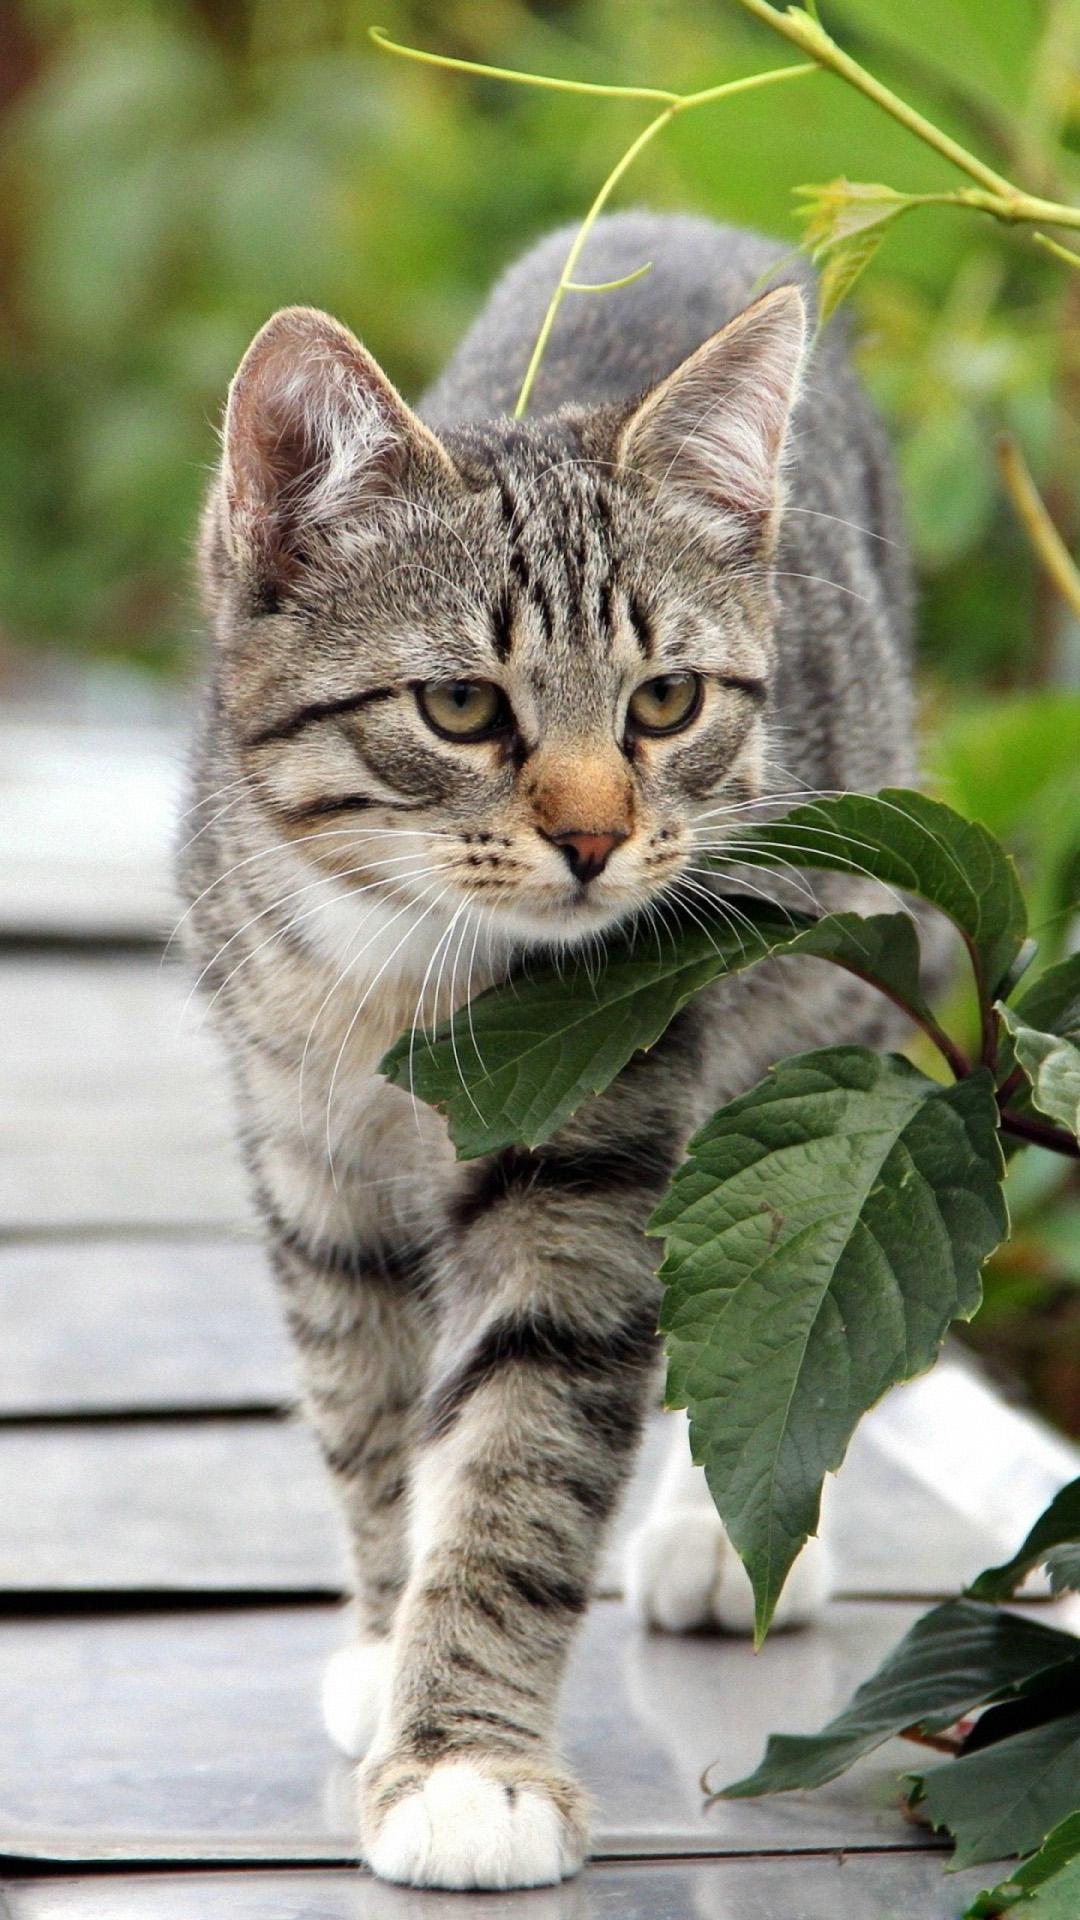 Cute Cat Hd Wallpapers For Mobile Cat Iphone Wallpapers Pixelstalk Net